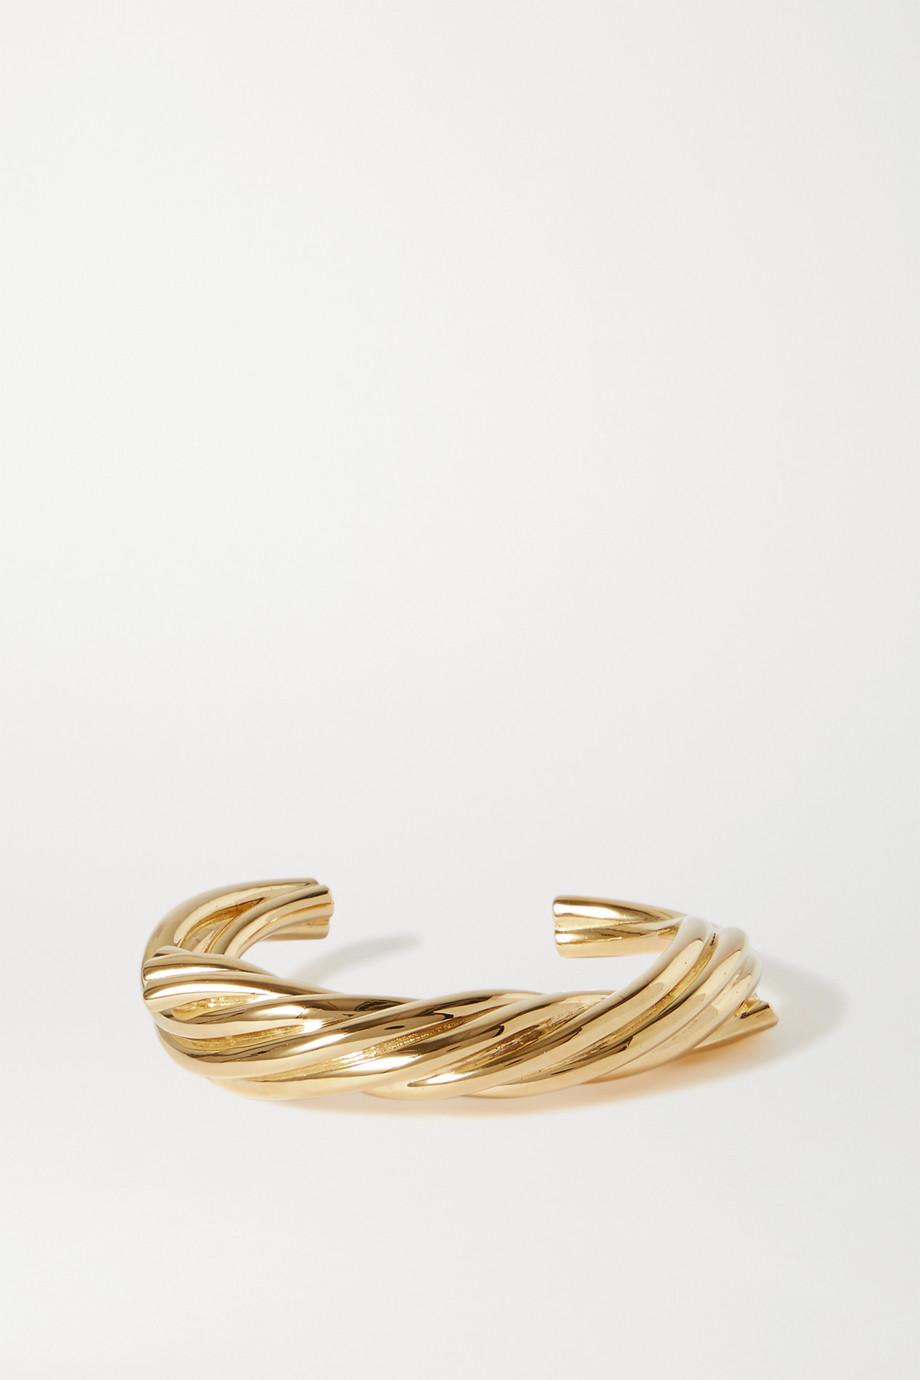 Bottega Veneta Goldfarbene Armspange